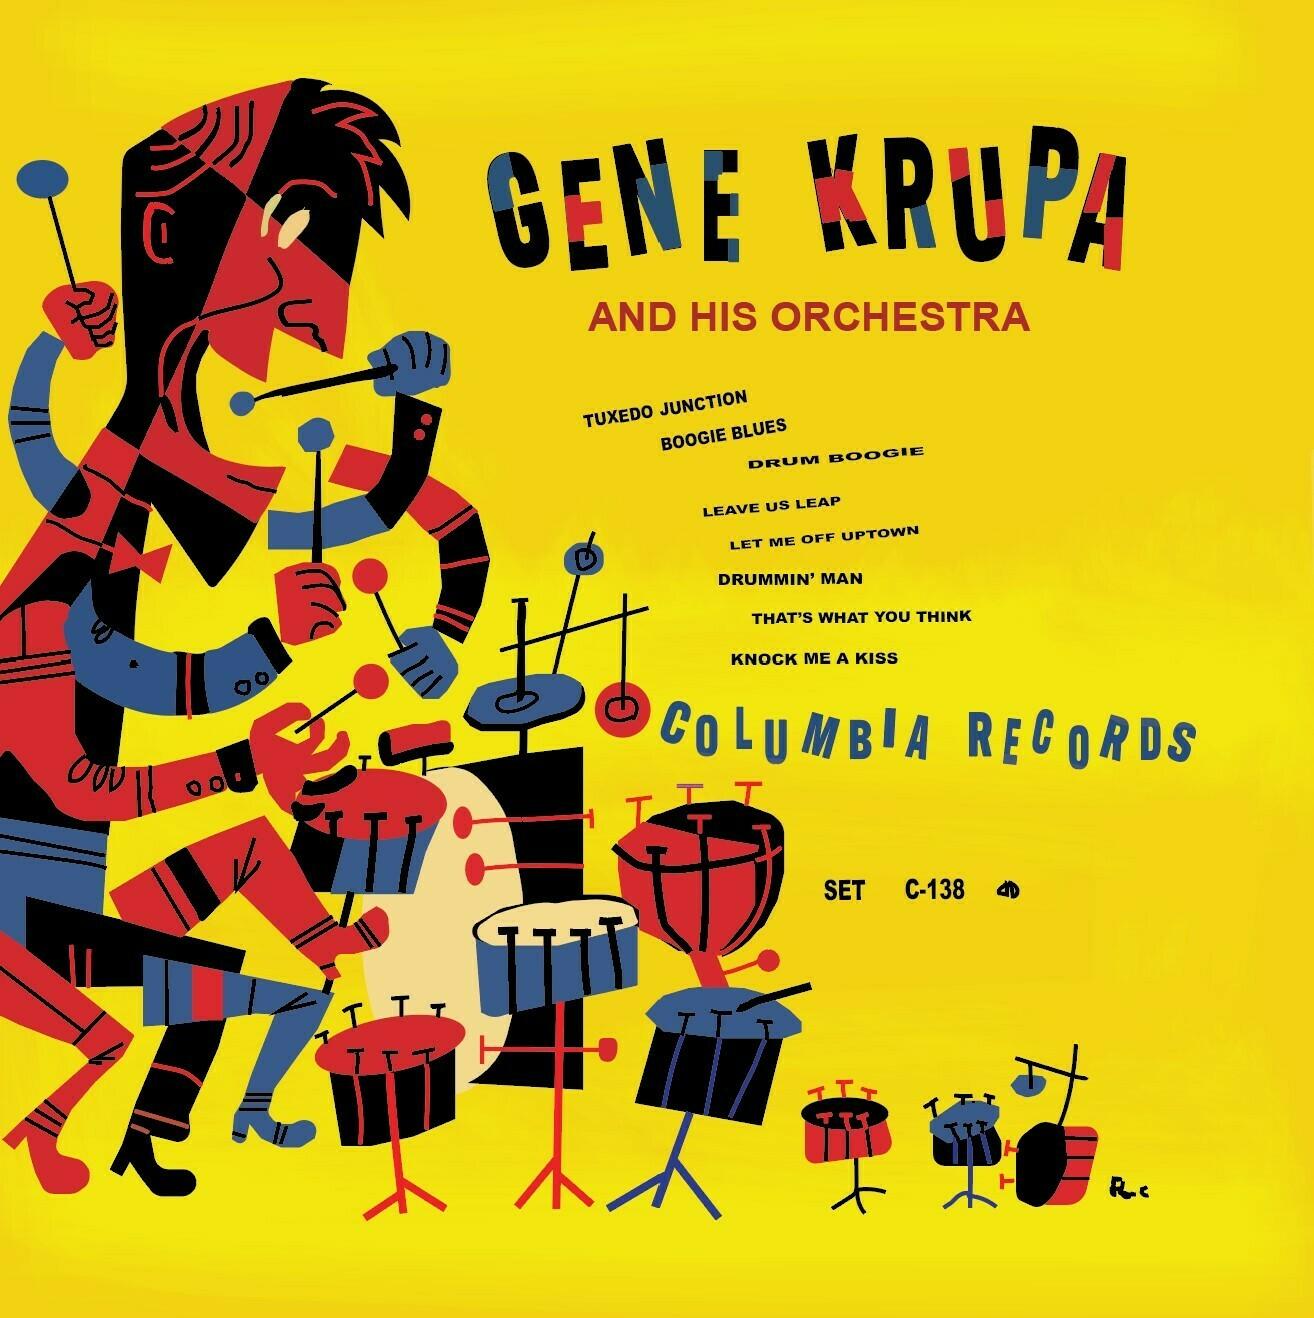 Gene Krupa - Duplicate Record Album Assignment - Digital Art